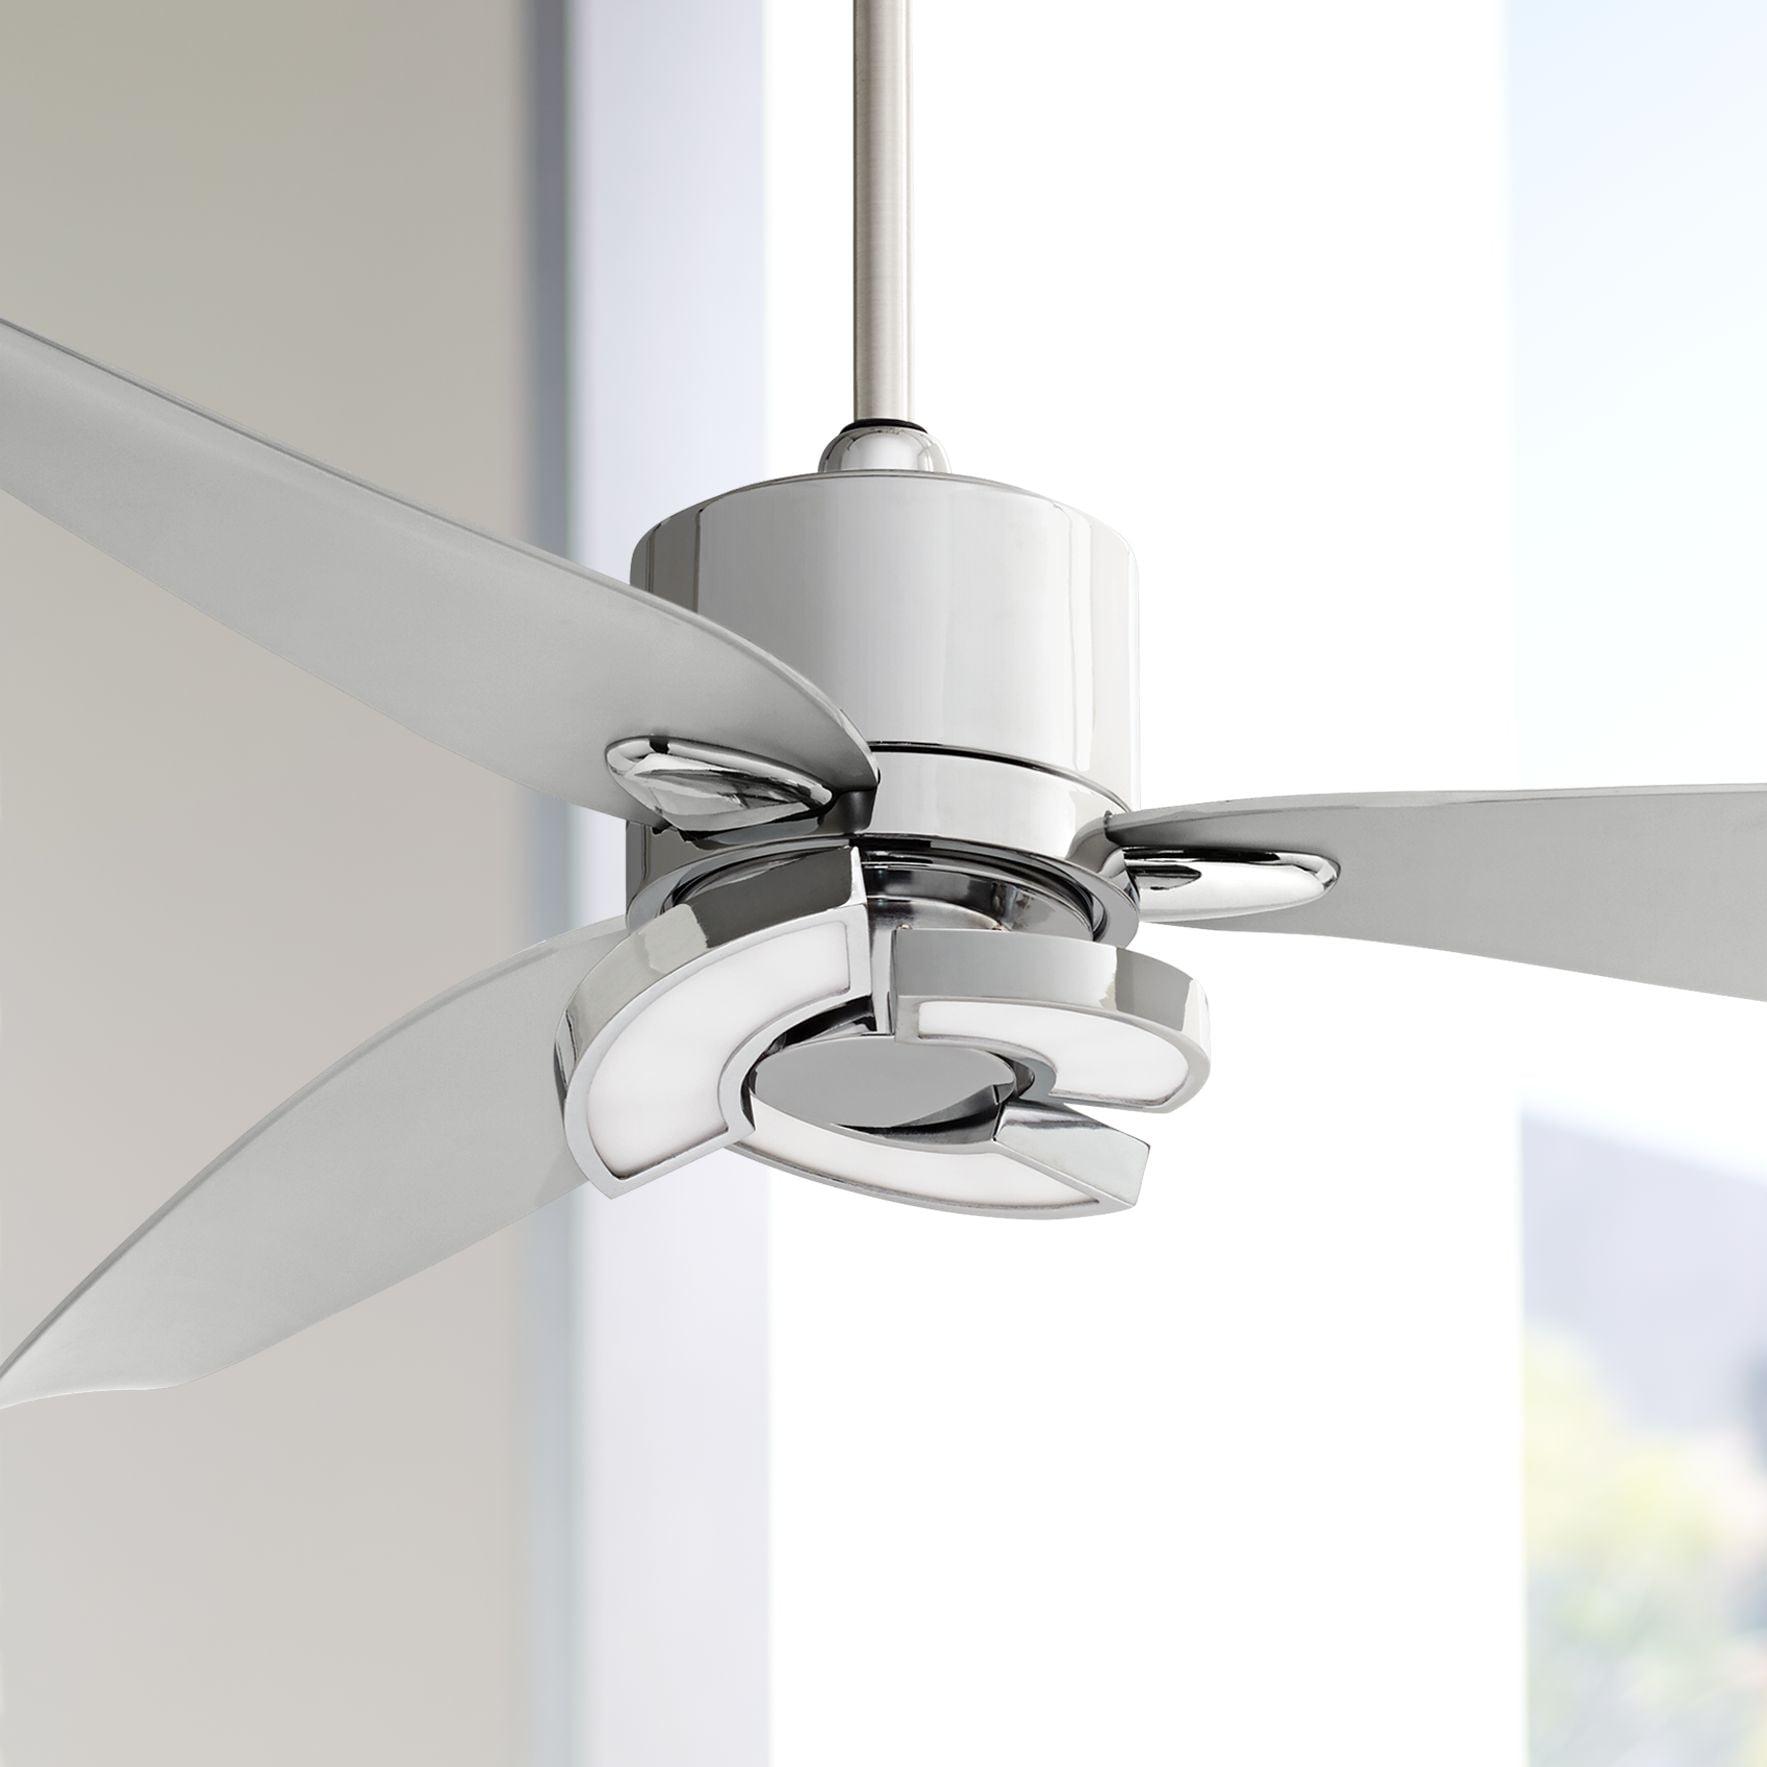 56 Possini Euro Design Modern Ceiling Fan With Light Led Remote Control Chrome Curved Blades For Living Room Kitchen Bedroom Walmart Com Walmart Com